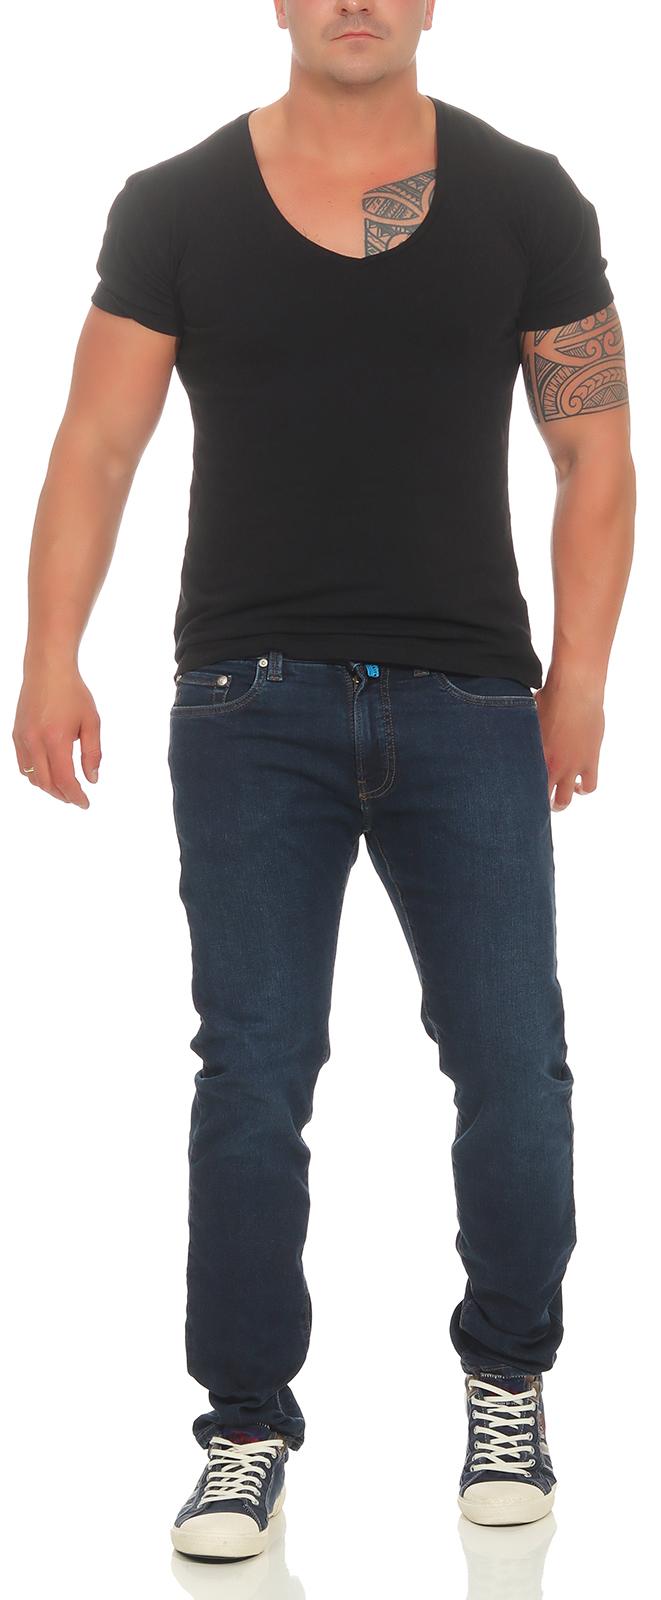 Pierre-Cardin-Jeans-Herren-Hose-Lyon-Tapered-Futureflex-3451-8880-73